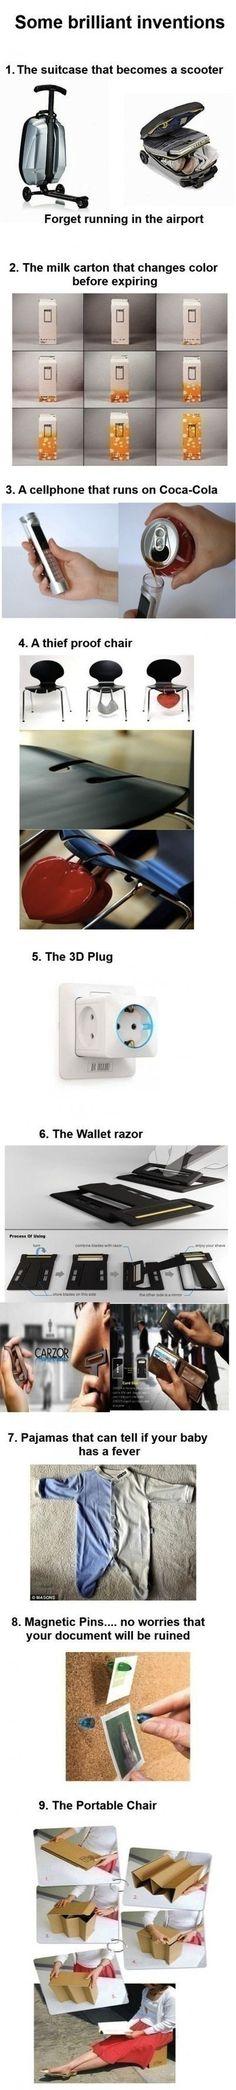 Some brilliant inventions.